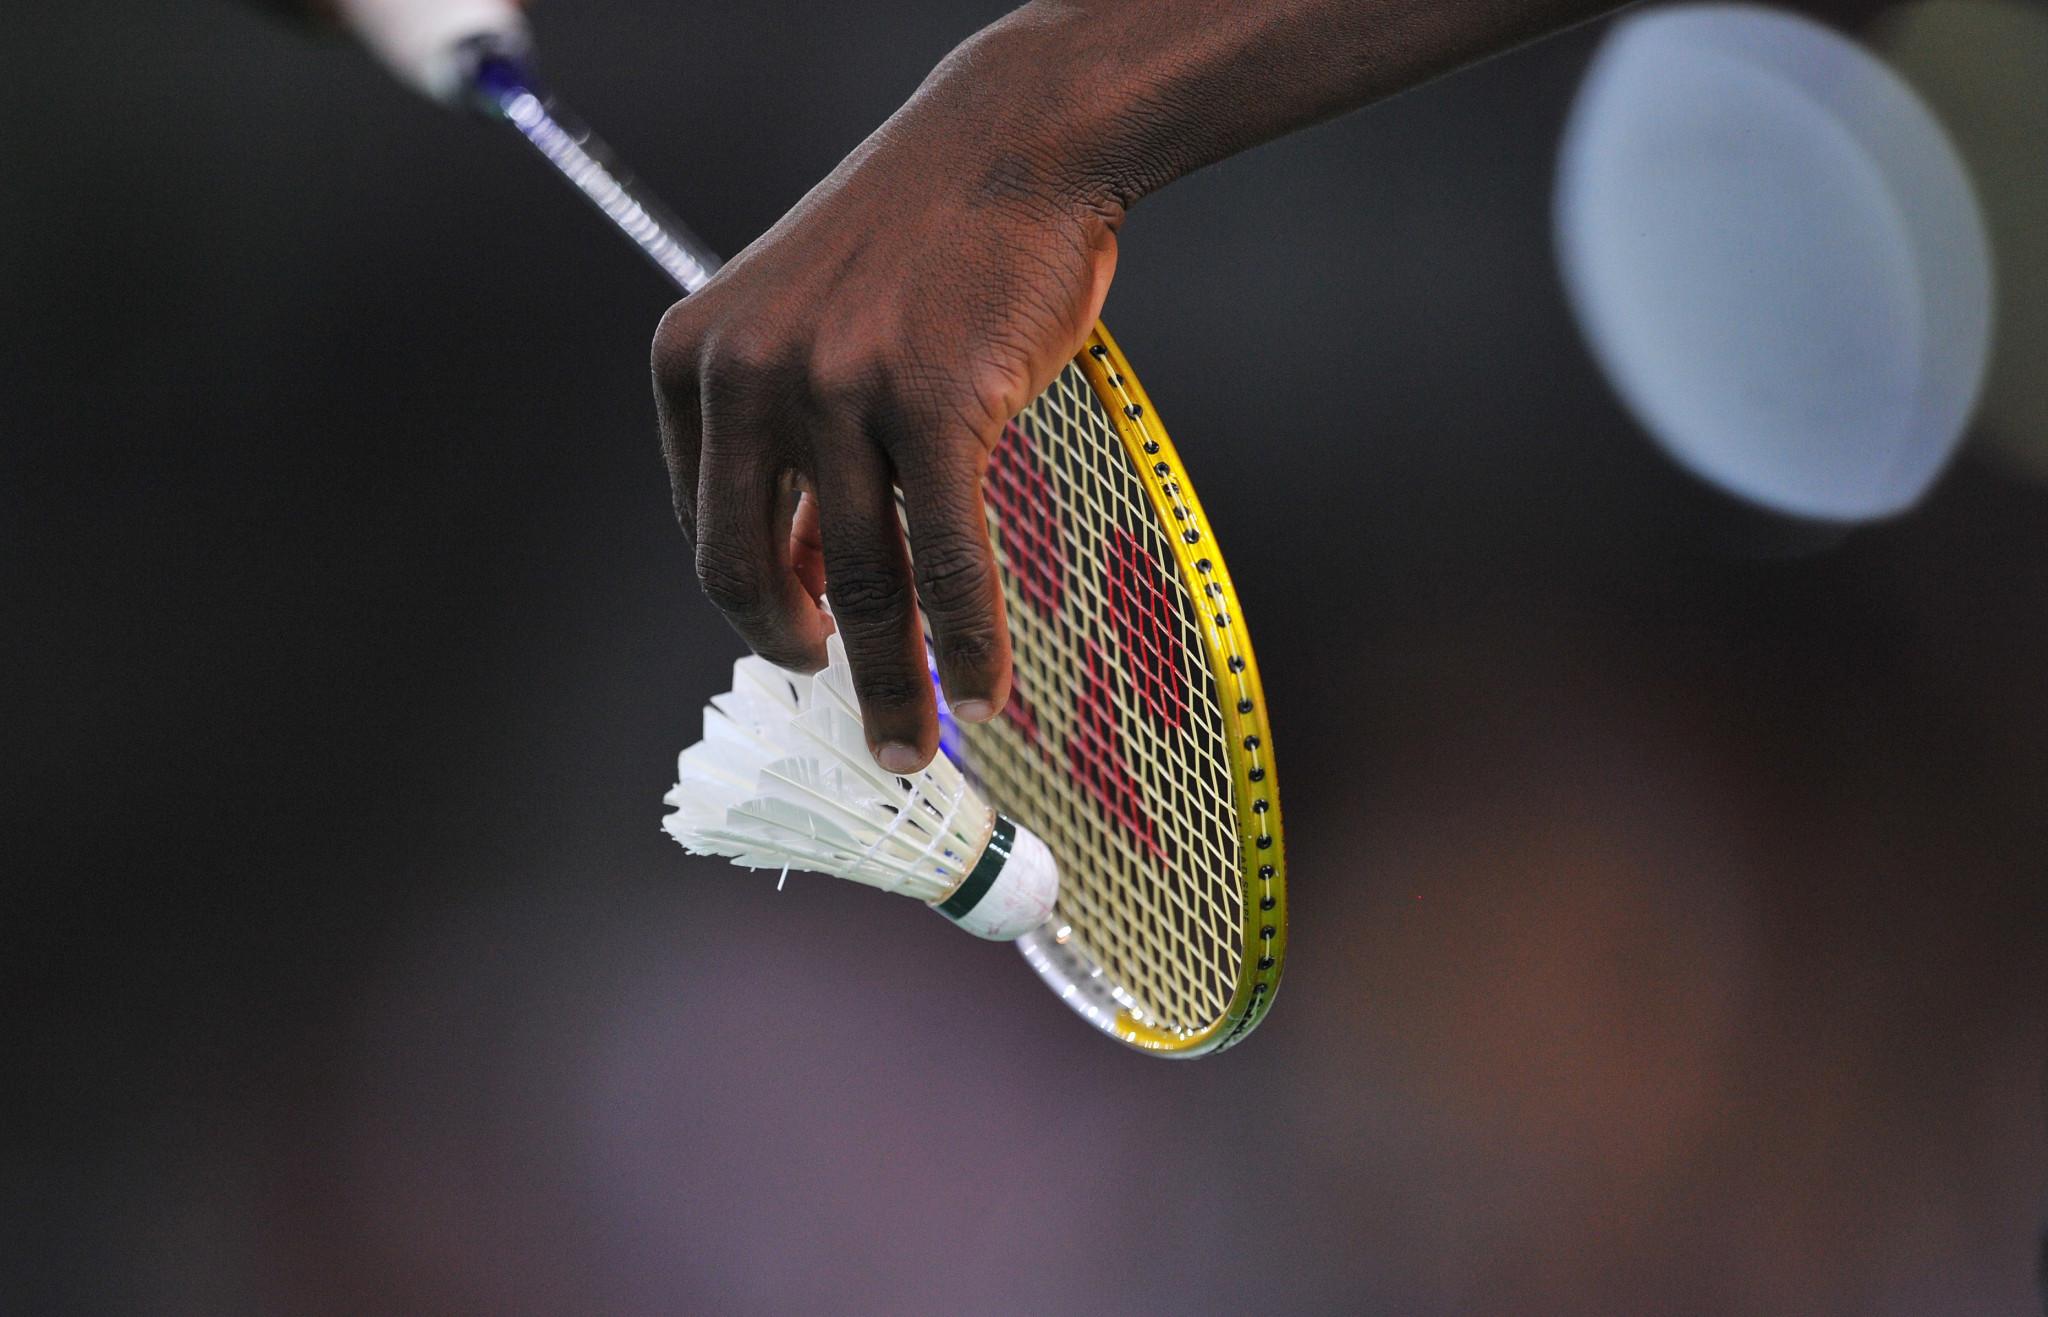 African Para badminton champion and Tokyo 2020 hopeful dies